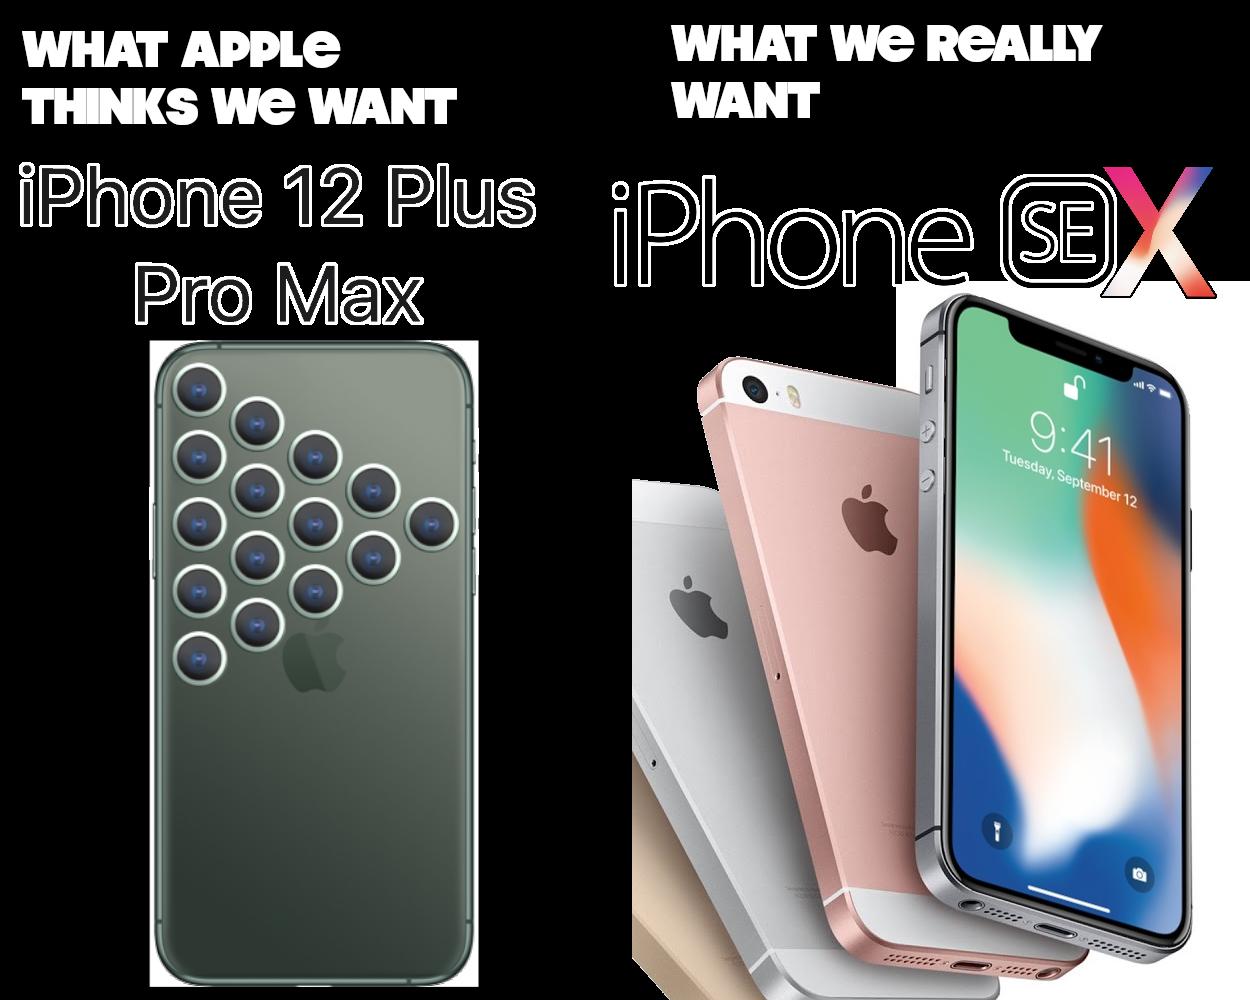 iphone 12 vs SE X3